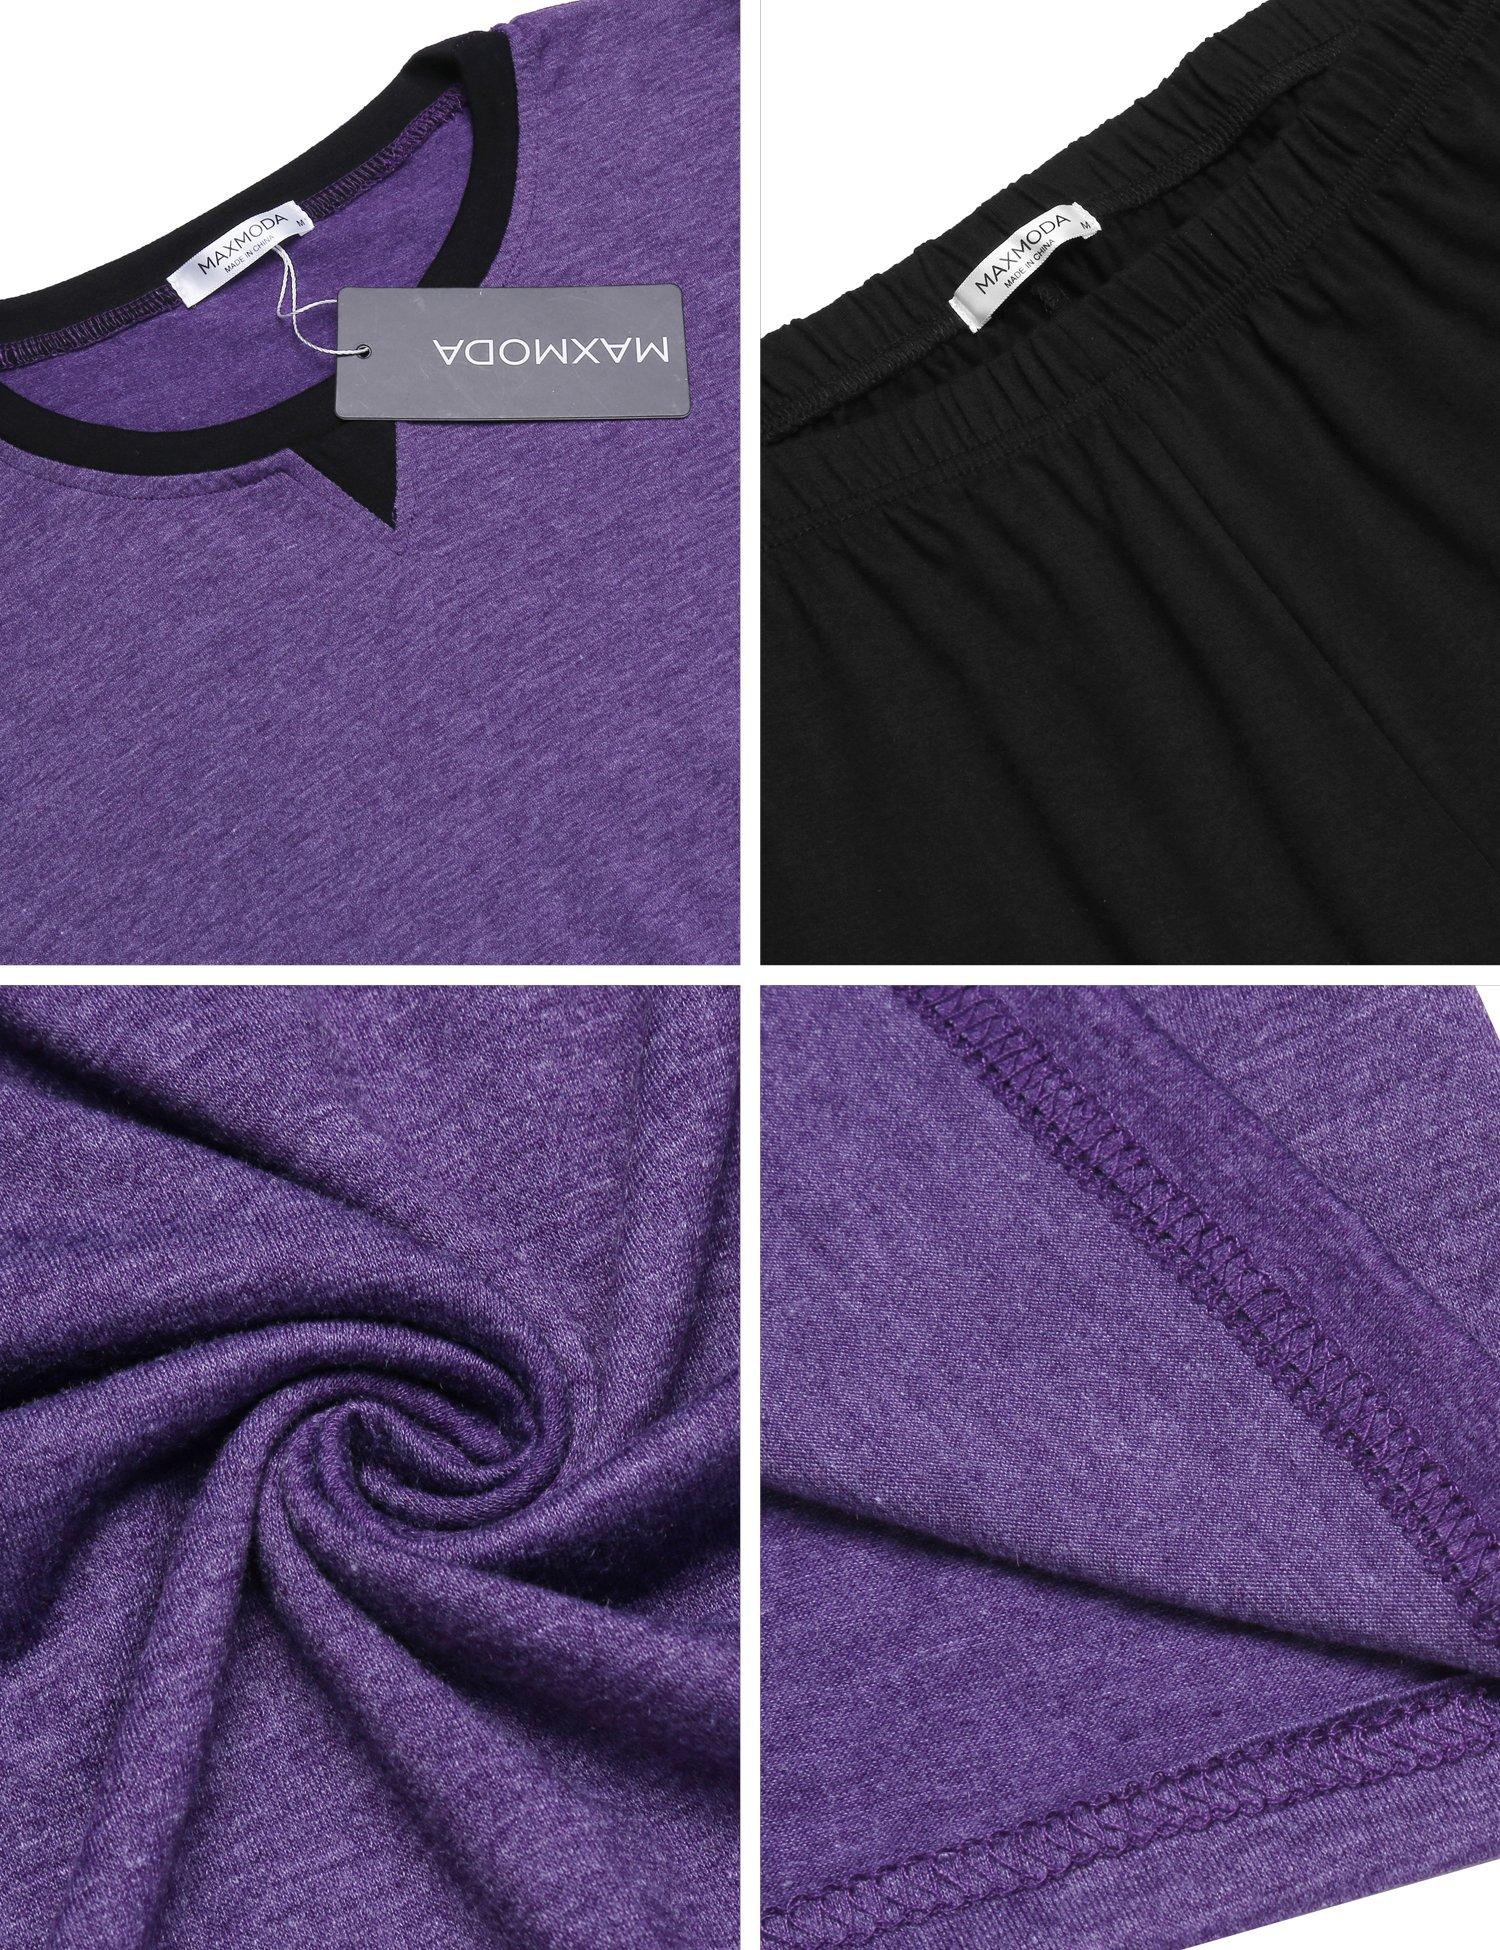 MAXMODA Soft Pajamas Long Sleeve Sleepwear Soft PJ Set with Pants Purple L by MAXMODA (Image #6)